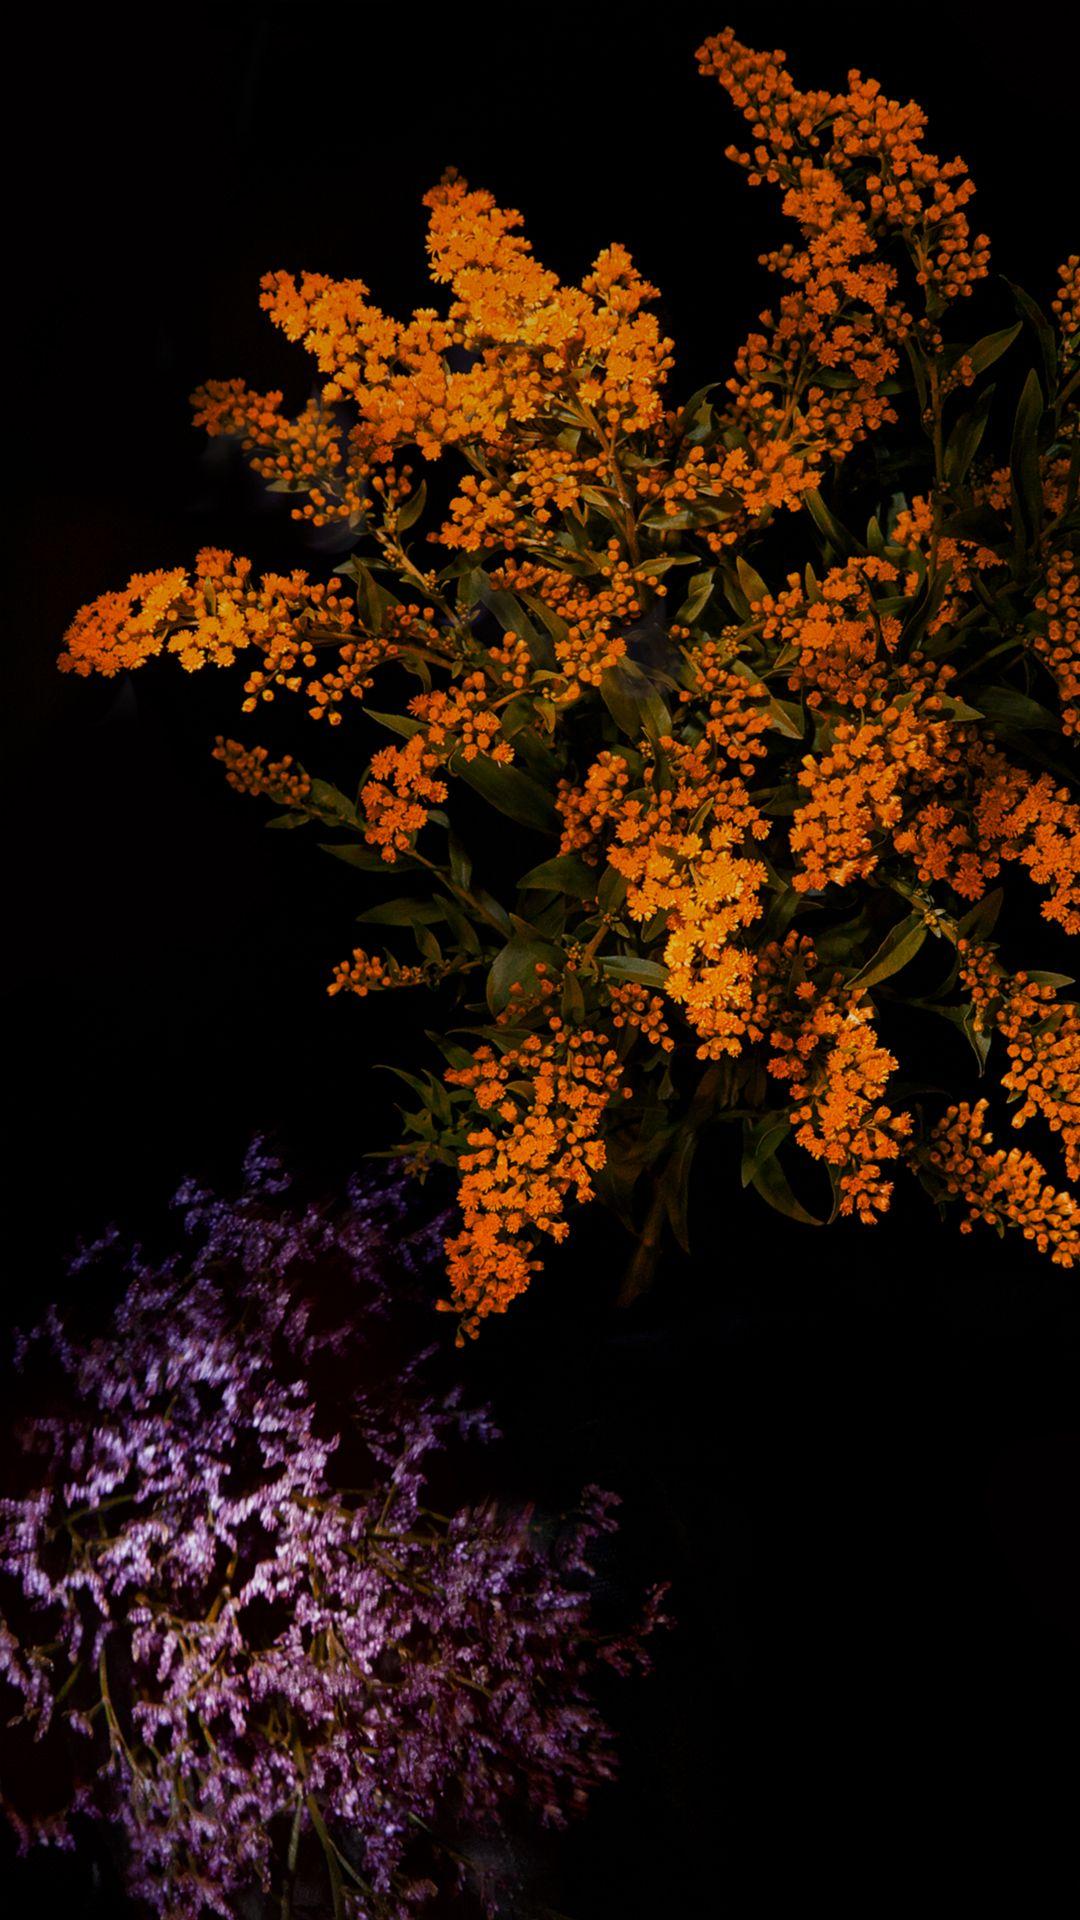 Fantasy Shiny Flower Tree Dark Ios9 Wallpaper Art Iphone 6 Wallpaper Download Iphone Wallpapers Wallpaper Iphone 4s Iphone 6s Wallpaper Art Wallpaper Iphone